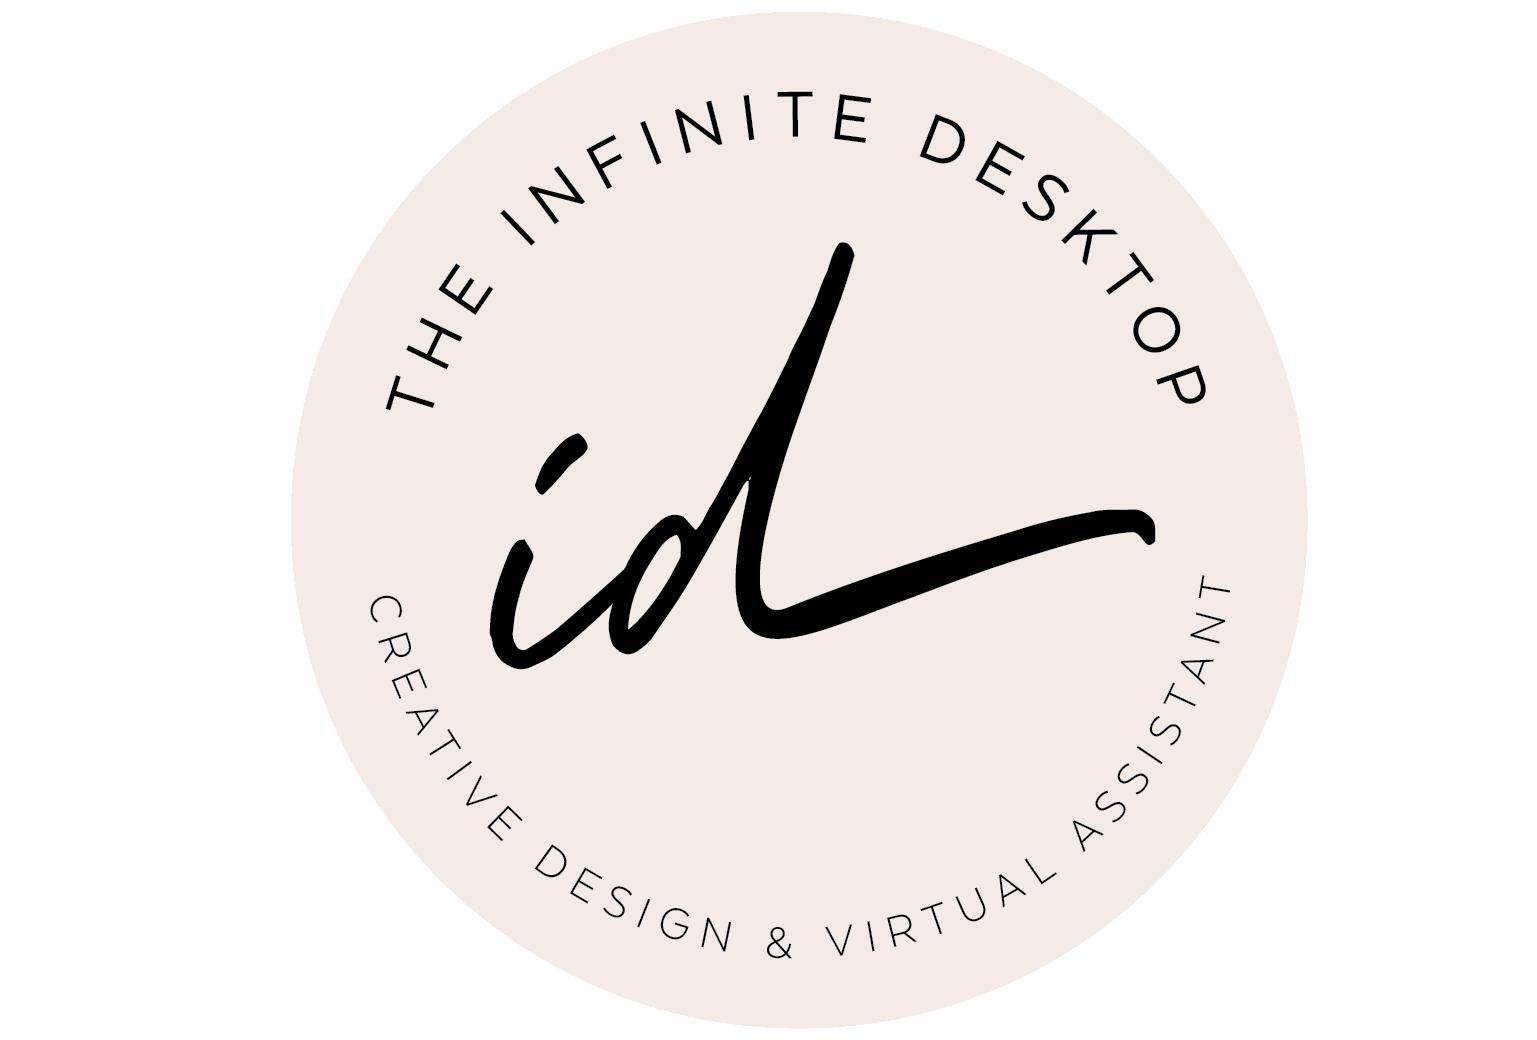 Logo-The Infinite Desktop_round-logo-cream black font